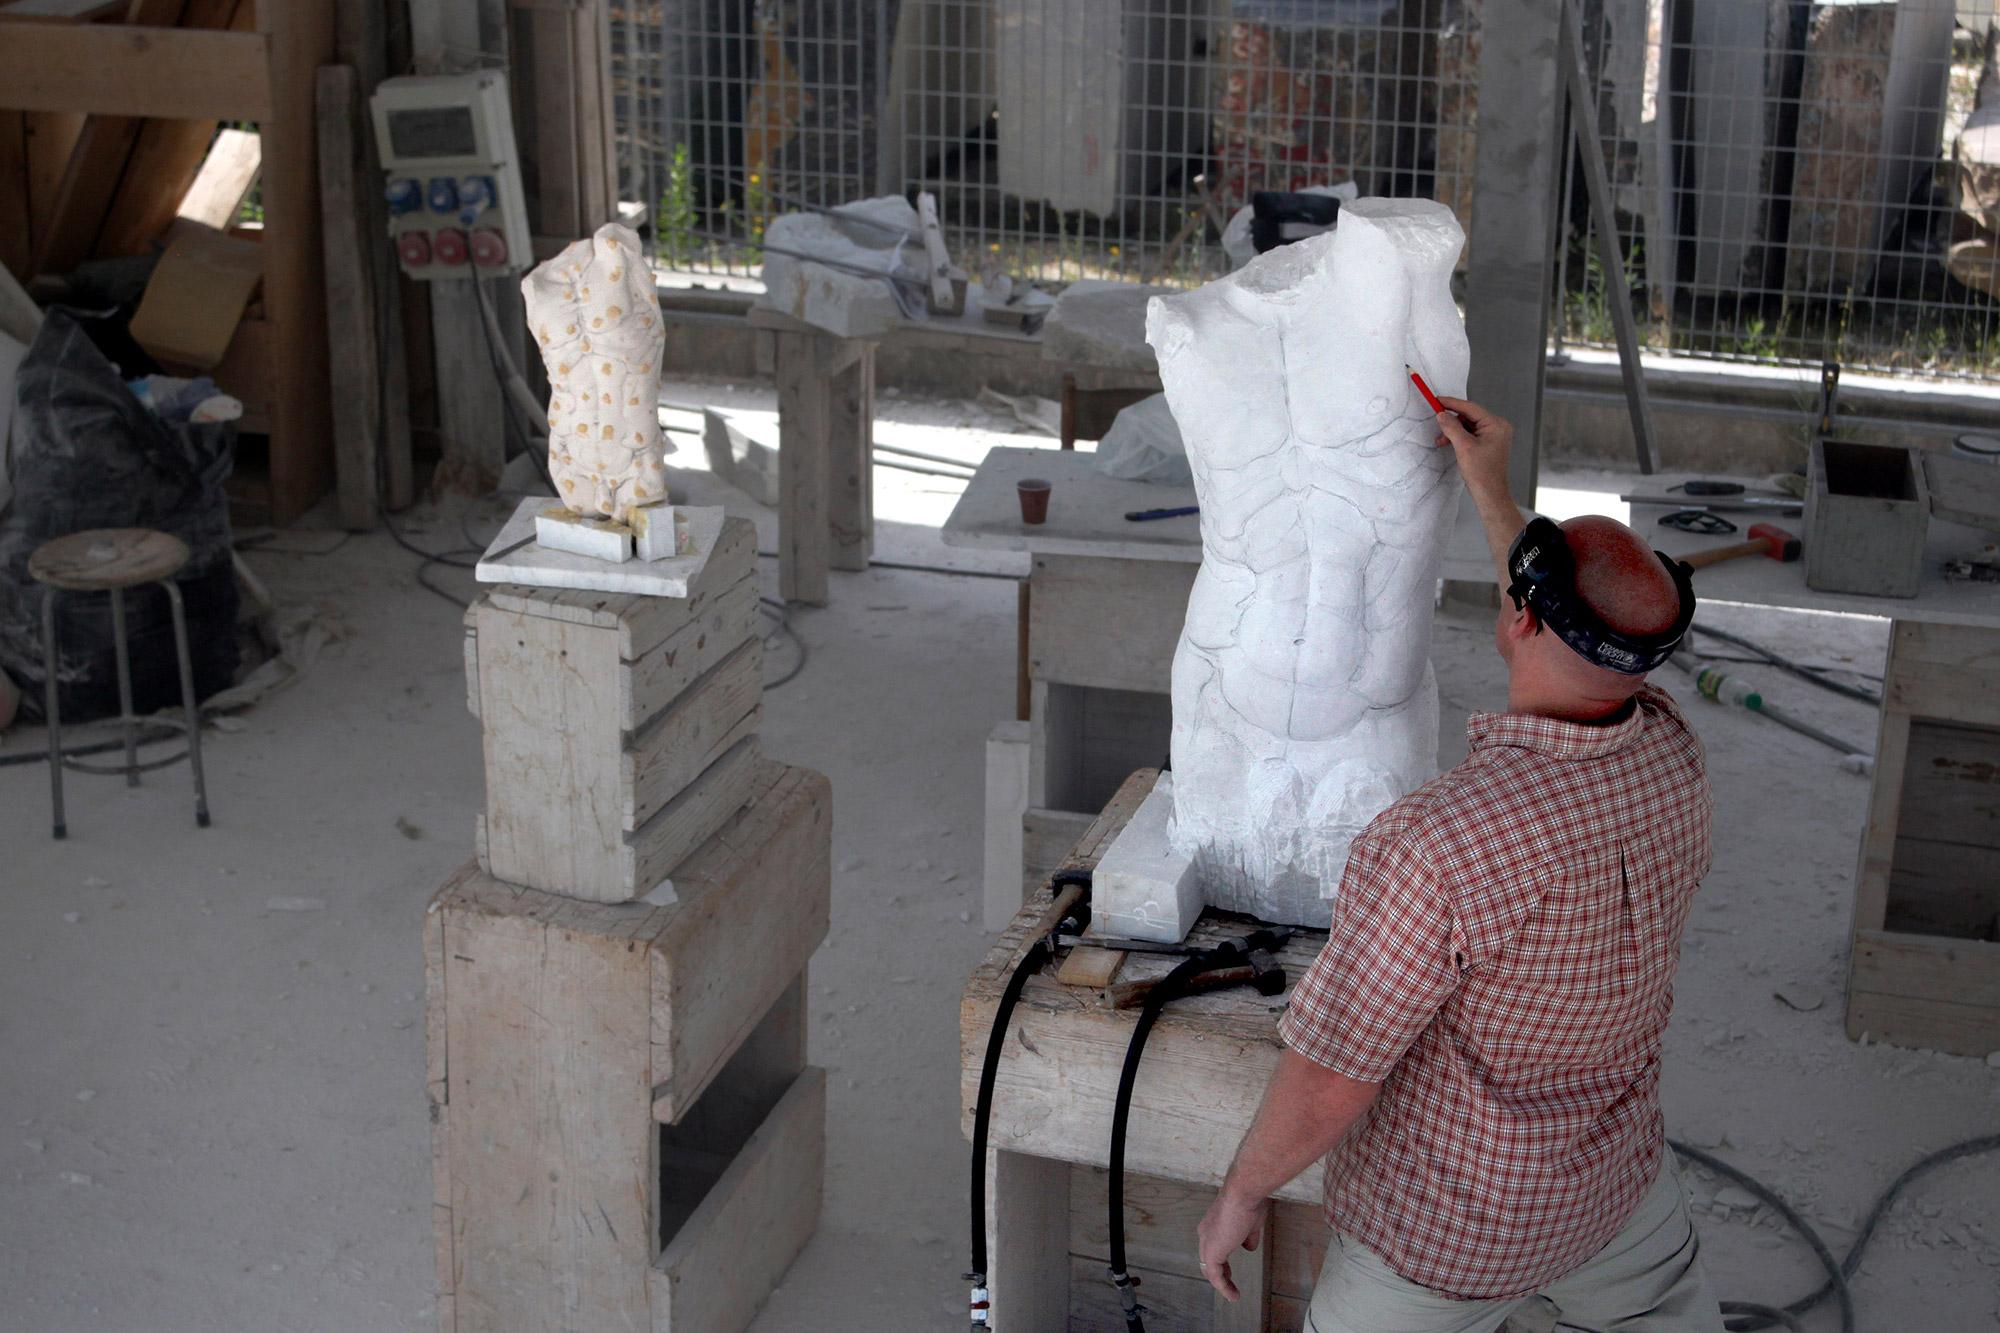 New-York-Academy-of-Art-Carrara-Residency-Joseph-Brickey20171213_0103.jpg